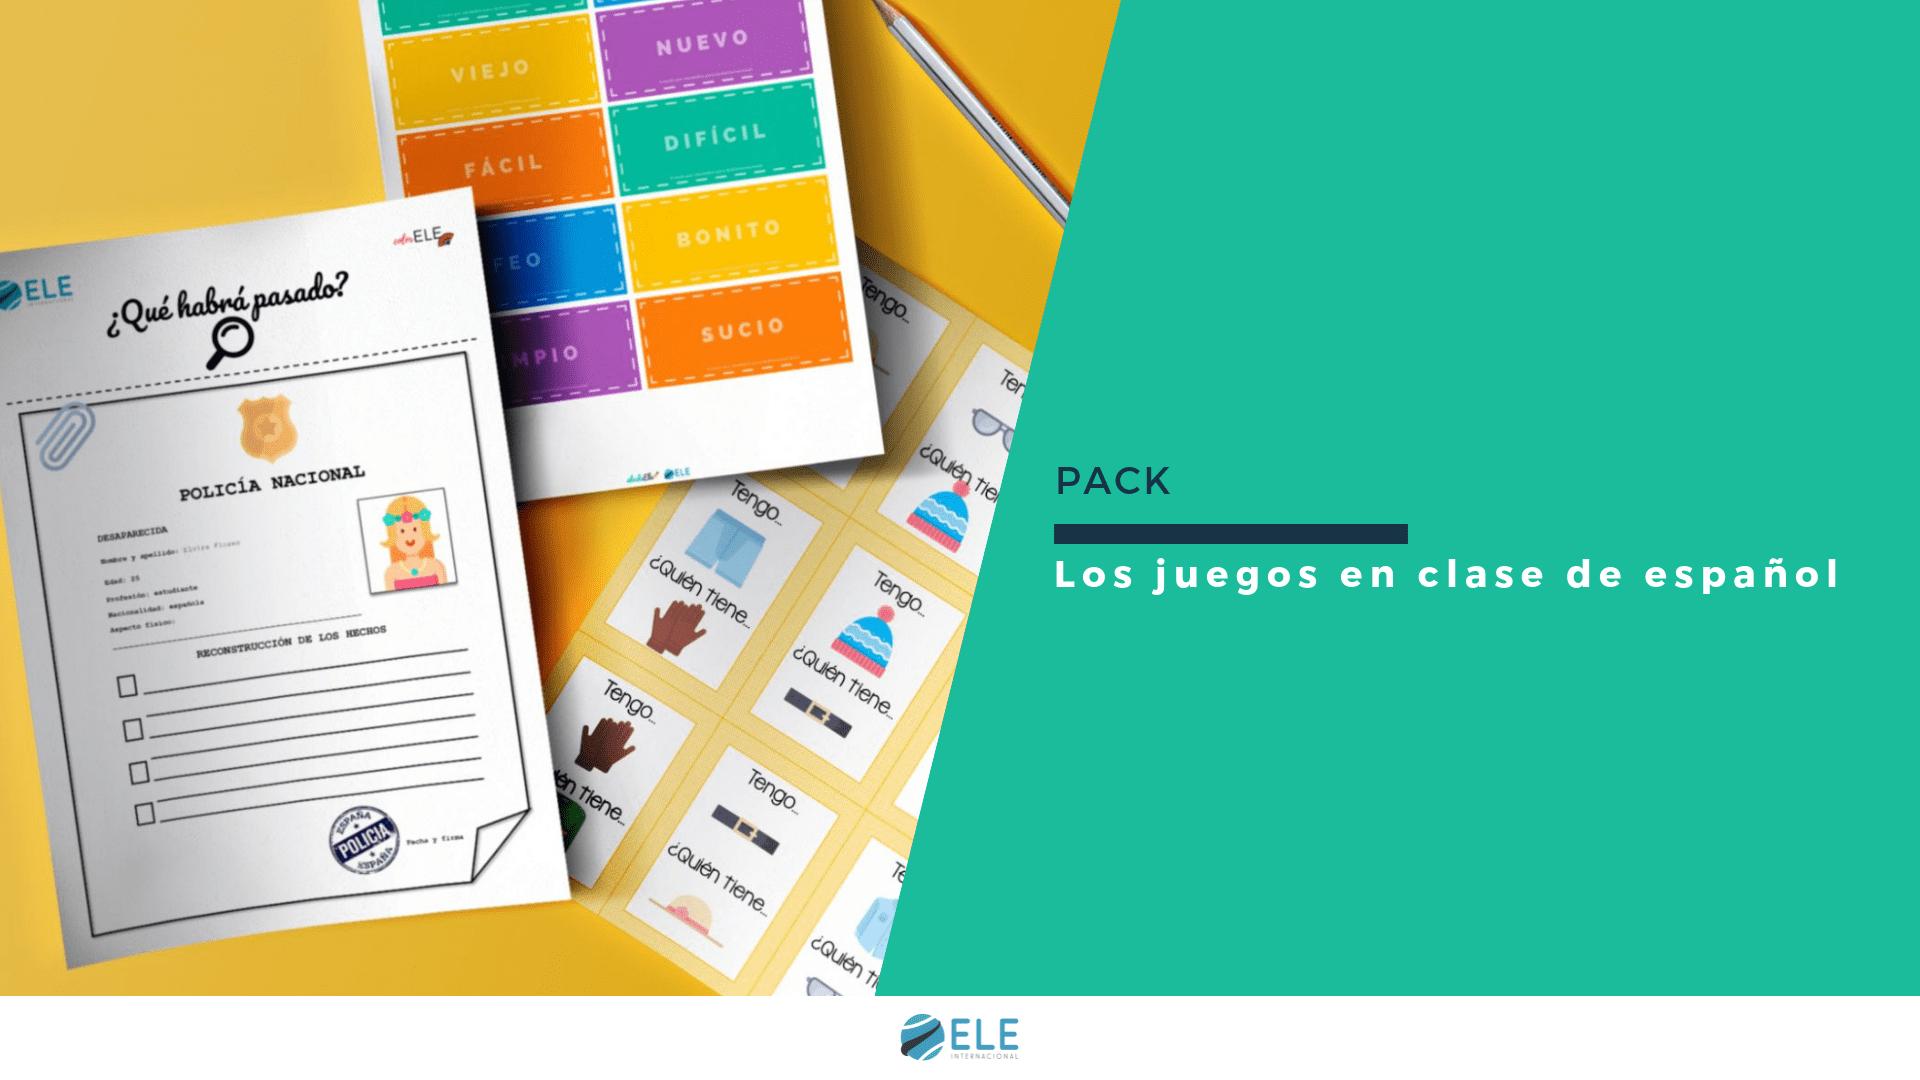 PACK DE JUEGOS PARA CLASE DE EPAÑOL. GAMIFICAR EN CLASE DE IDIOMAS. JUEGOS CLASE DE ELE. #SPANISHTEACHER #PROFEDEELE #RECURSOSEDUCATIVOS